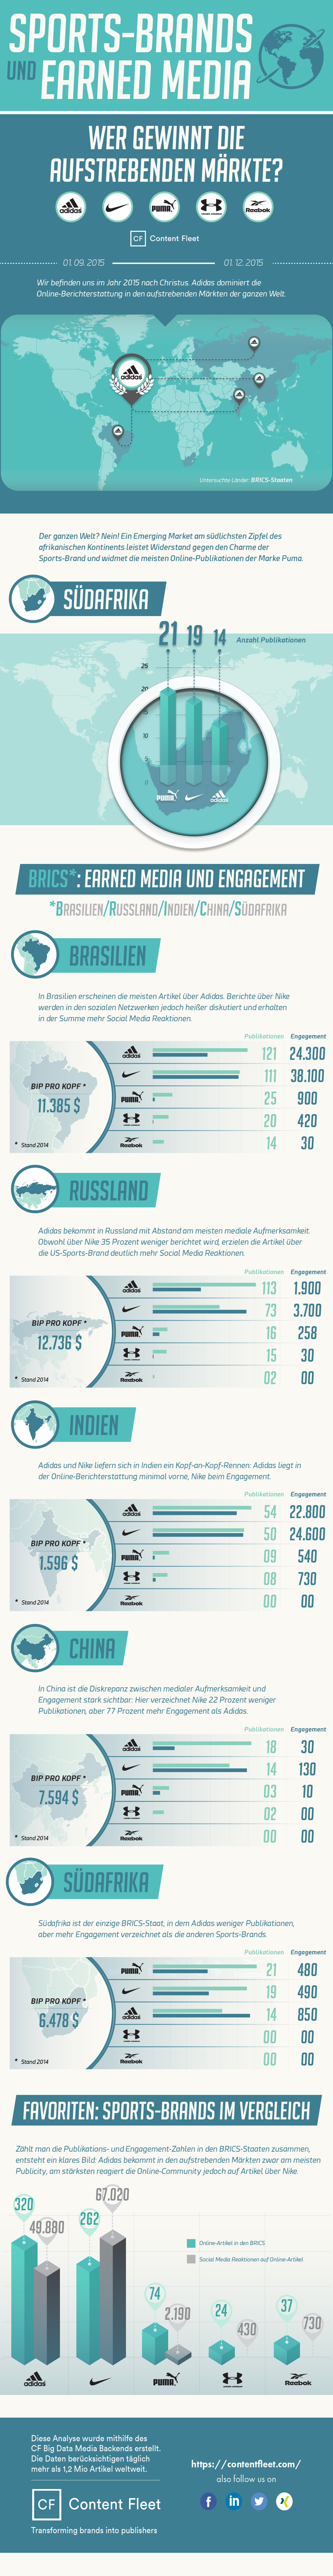 Sports-Brands-und-Earned-Media-Infografik